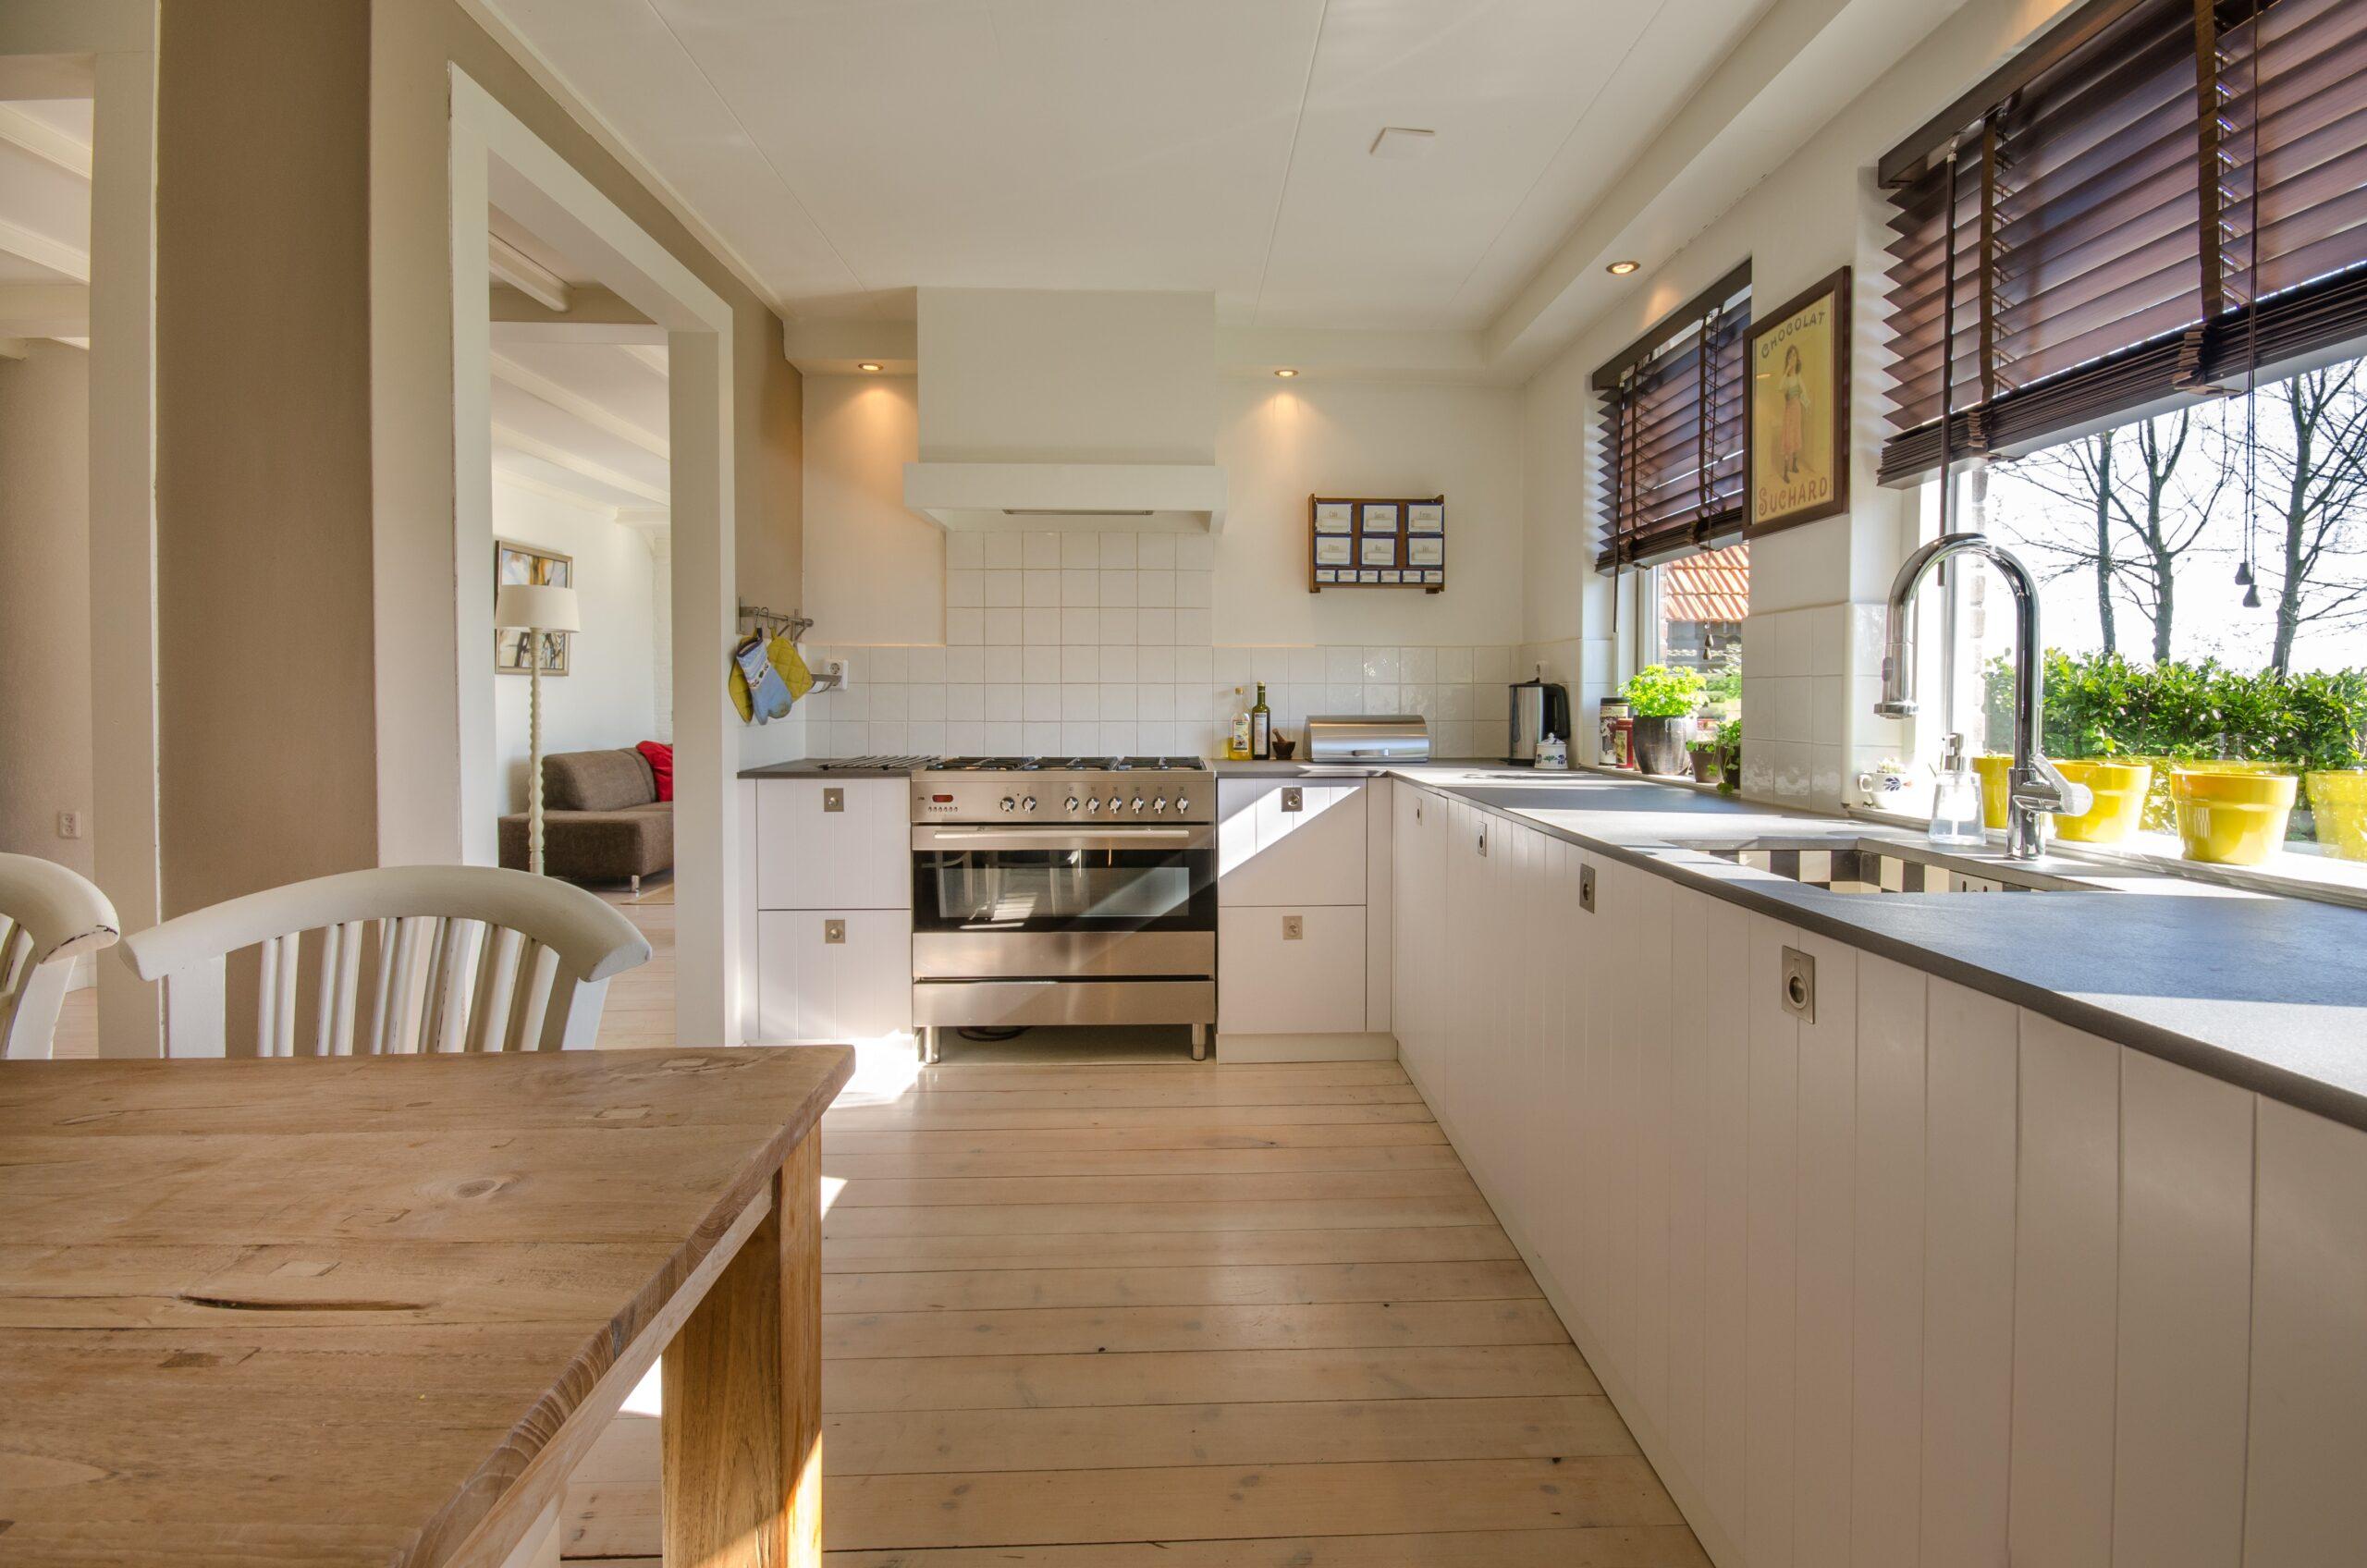 home interiors, the kitchen